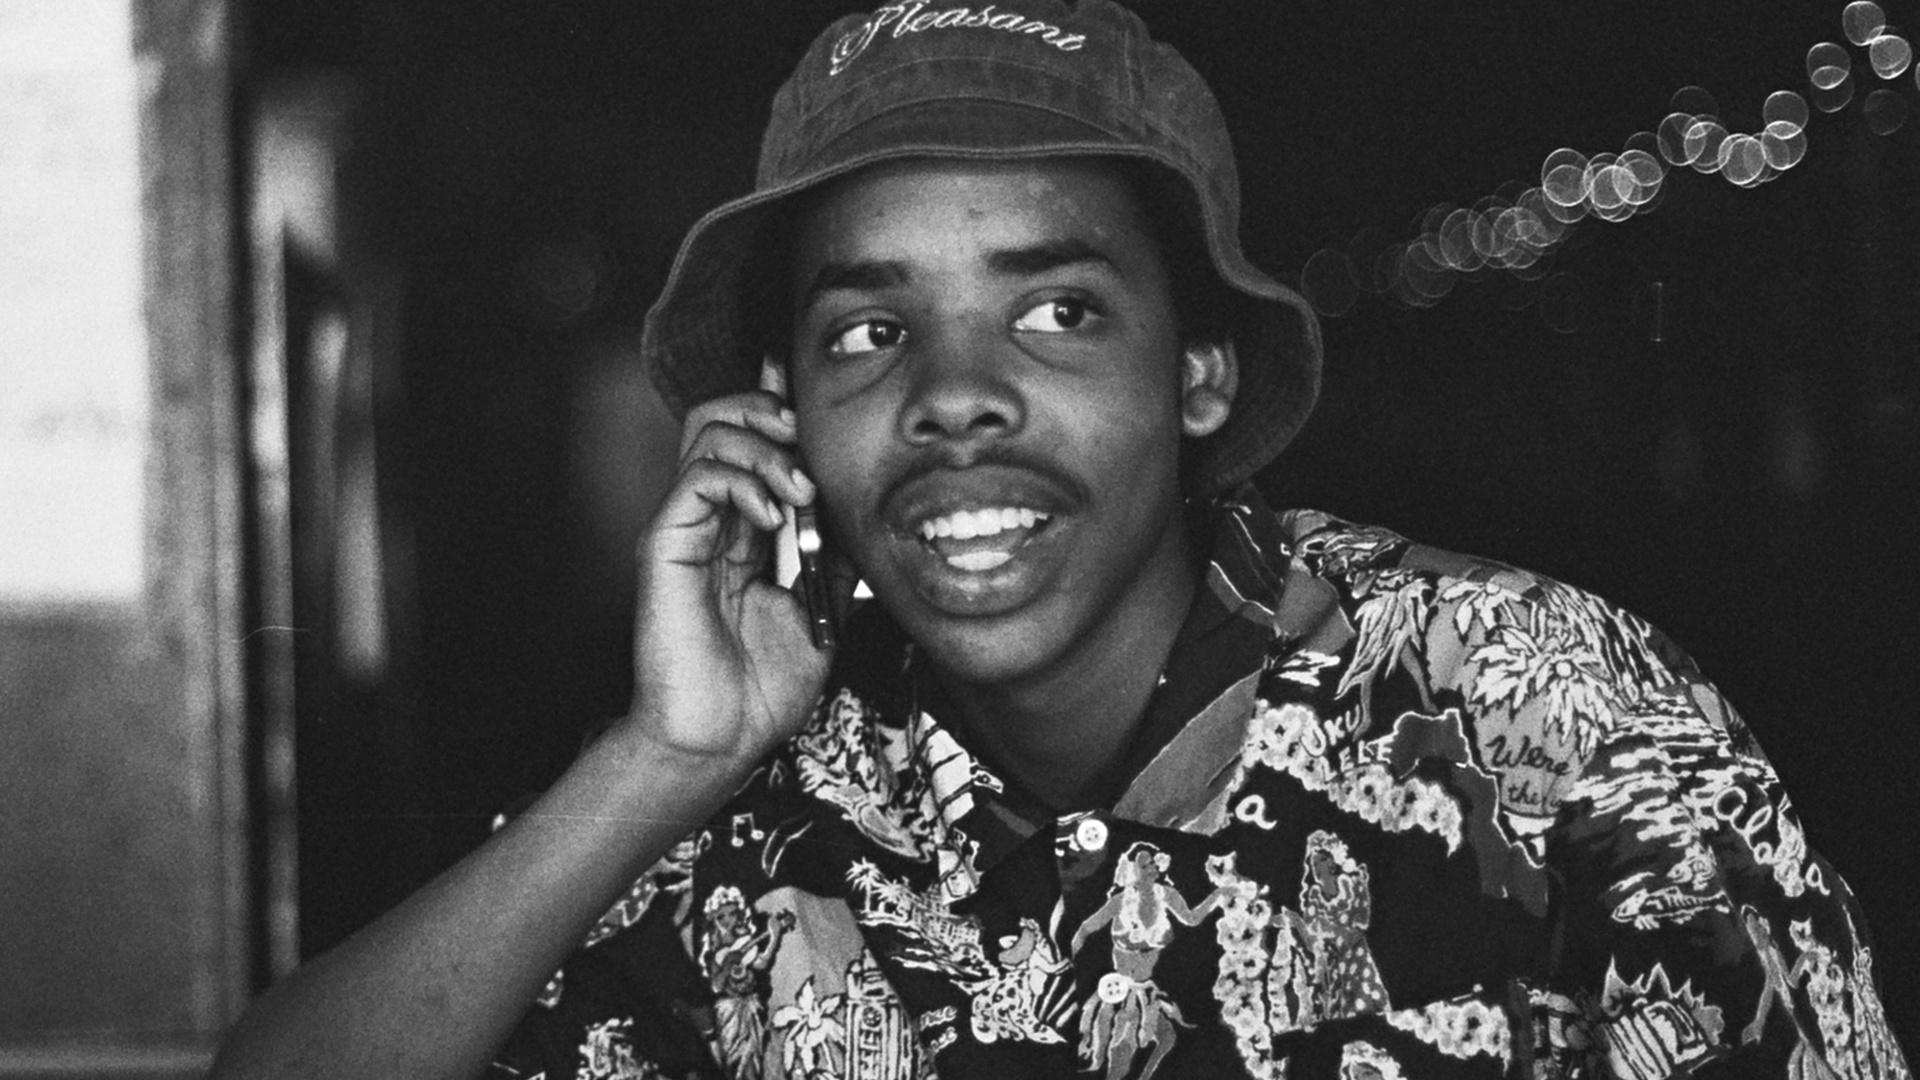 1920x1080-Singer-Rapper-Rap-Hip-Hop-Earl-Sweatshirt-wallpaper-wp340910